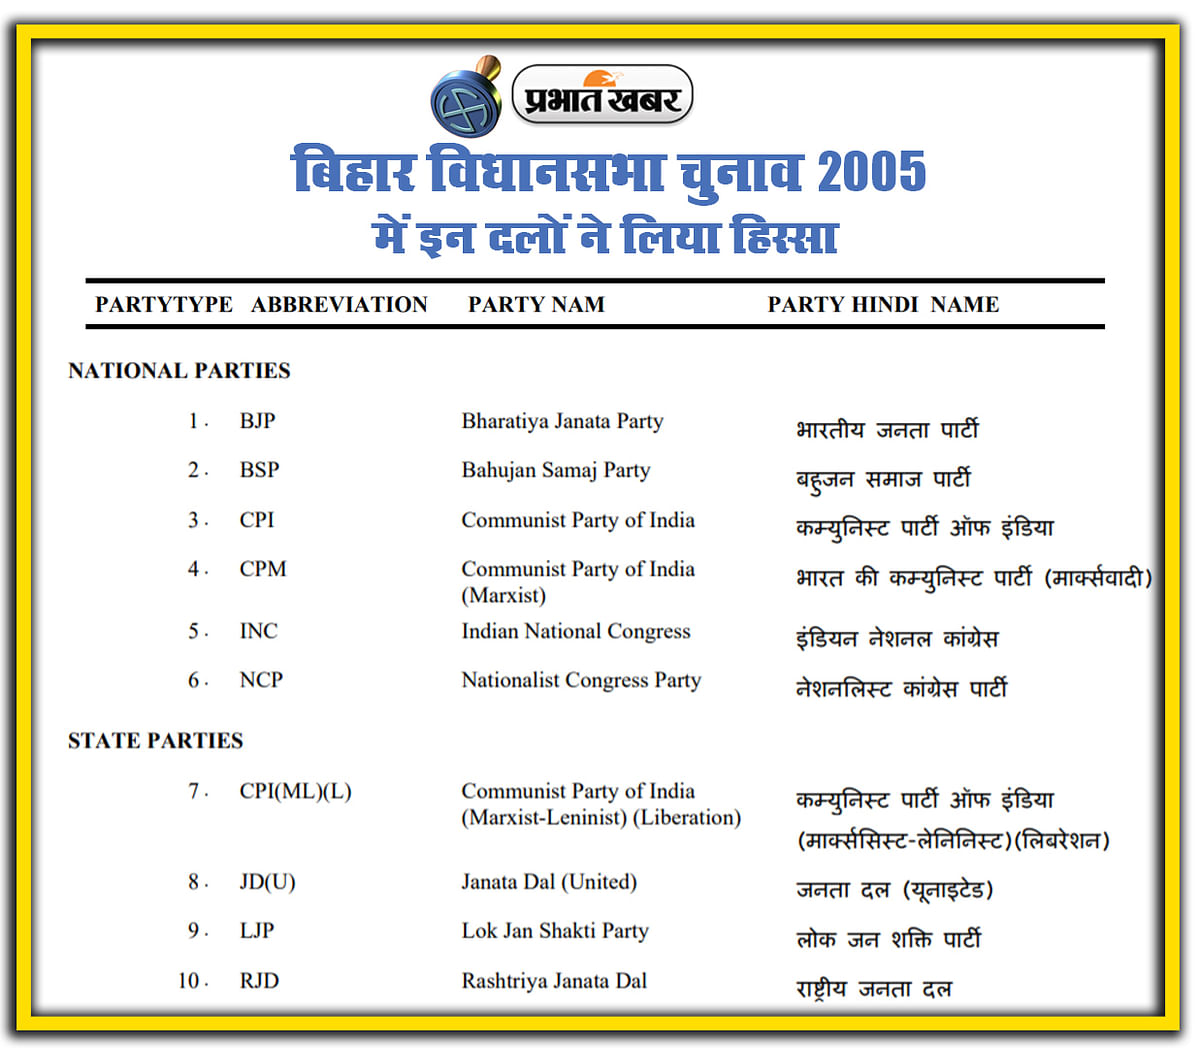 bihar vidhan sabha chunav 2005, National, State, Local Parties in Election